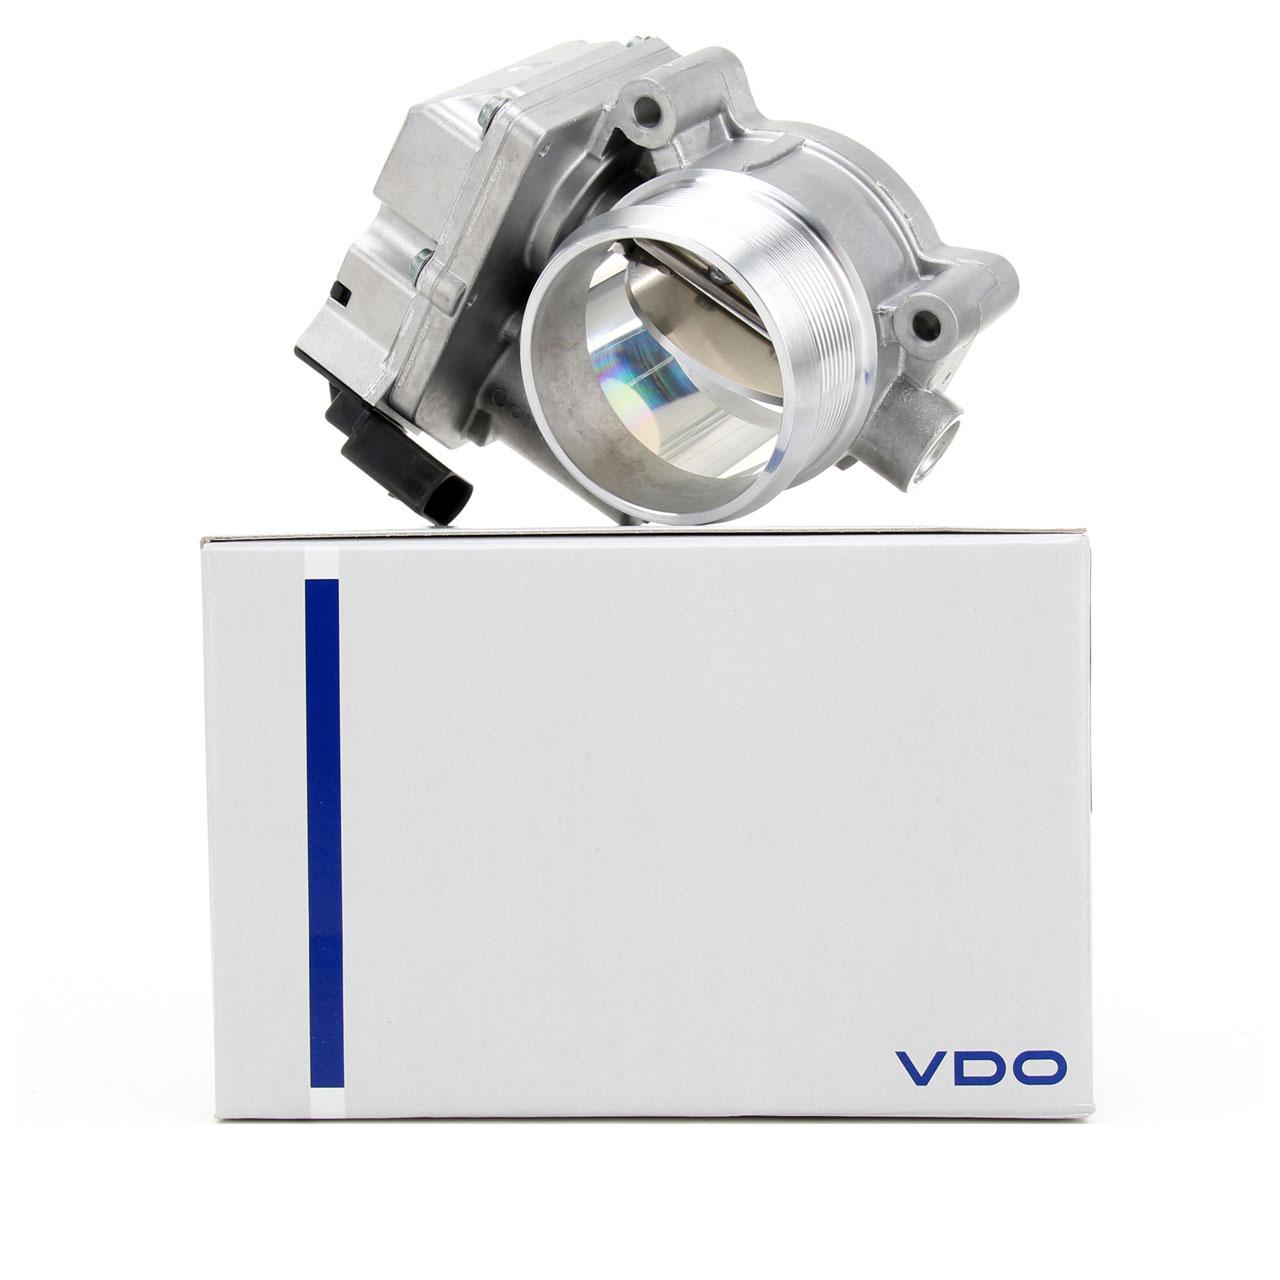 VDO Drosselklappe AUDI A4 A5 A6 A8 Q5 Q7 VW Touareg 2.7 3.0 TDI 4E0145950J